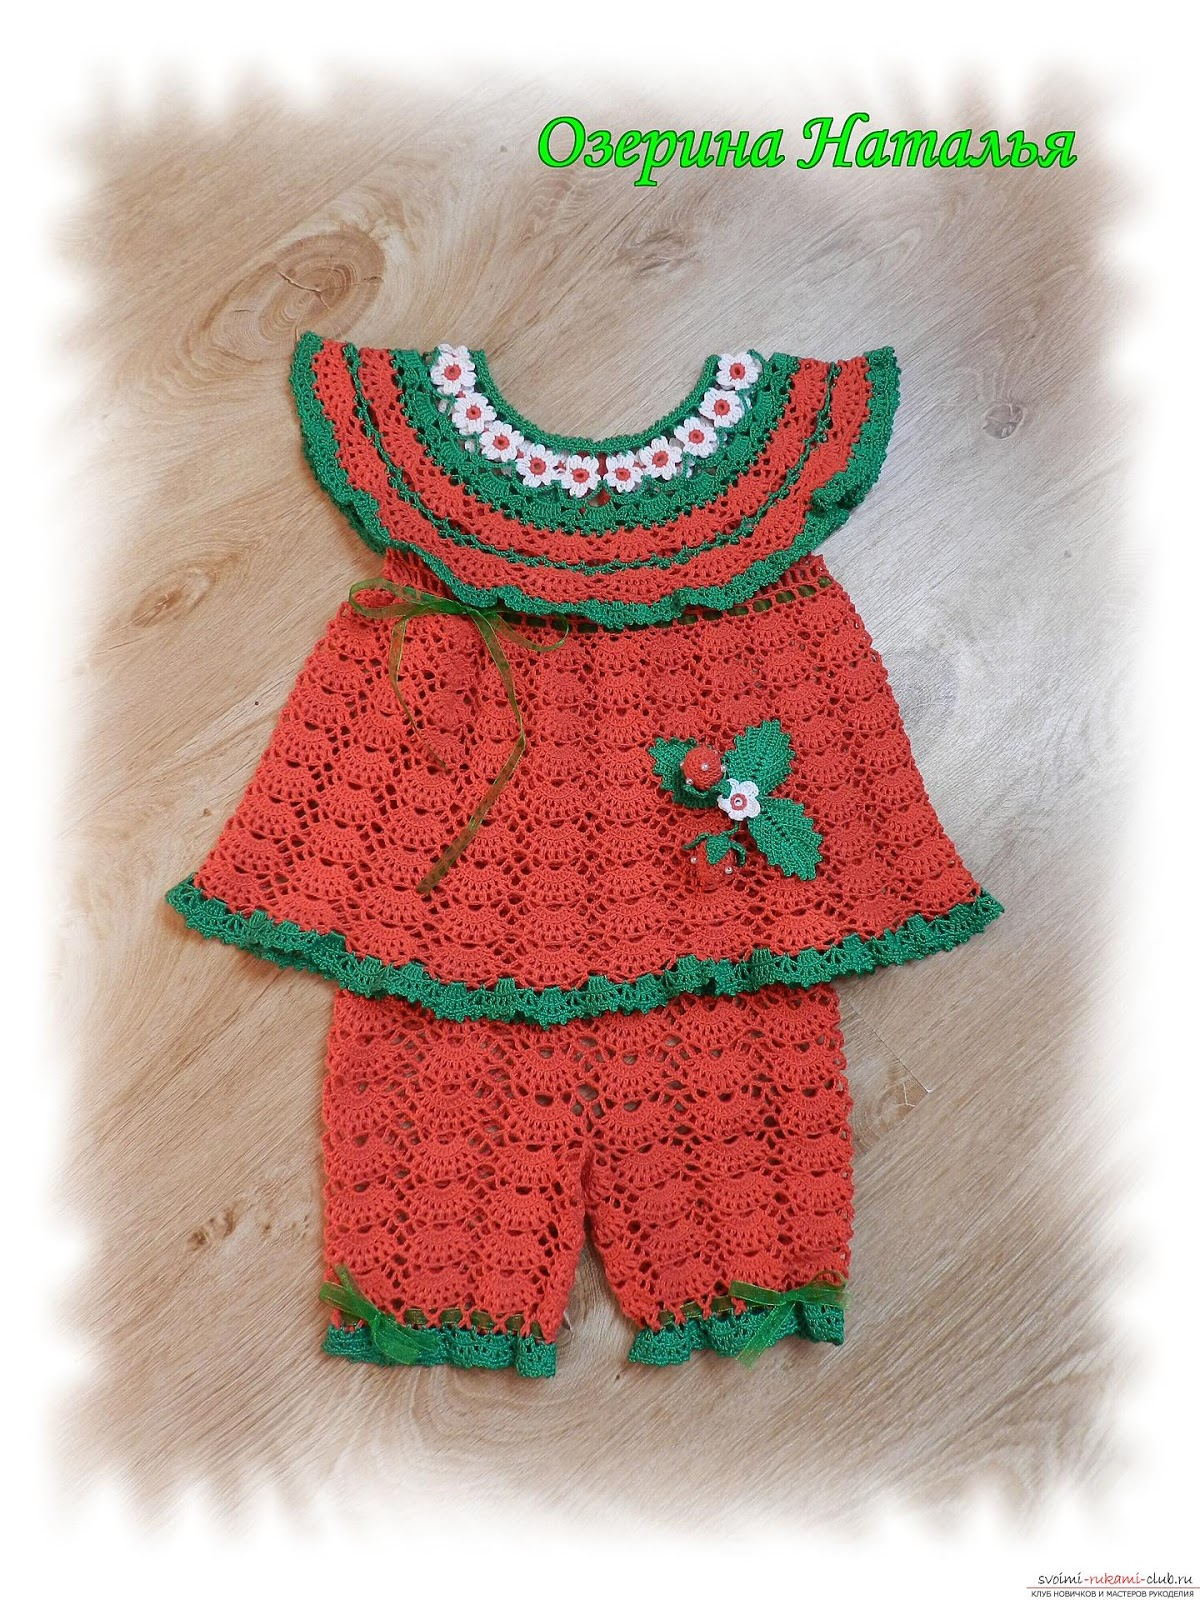 free vintage crochet patterns pdf